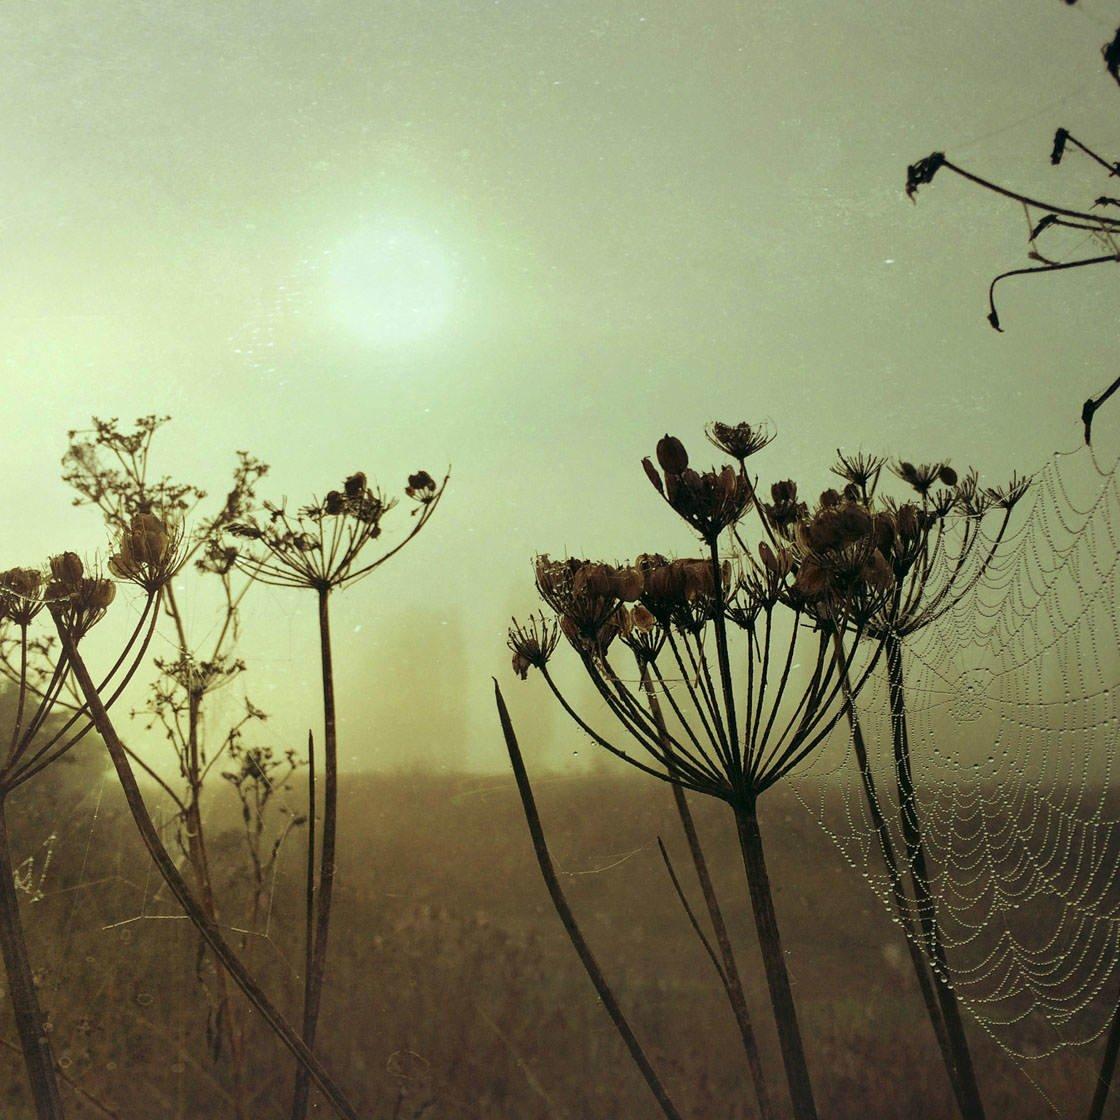 Fog & Mist iPhone Photos 46 no script